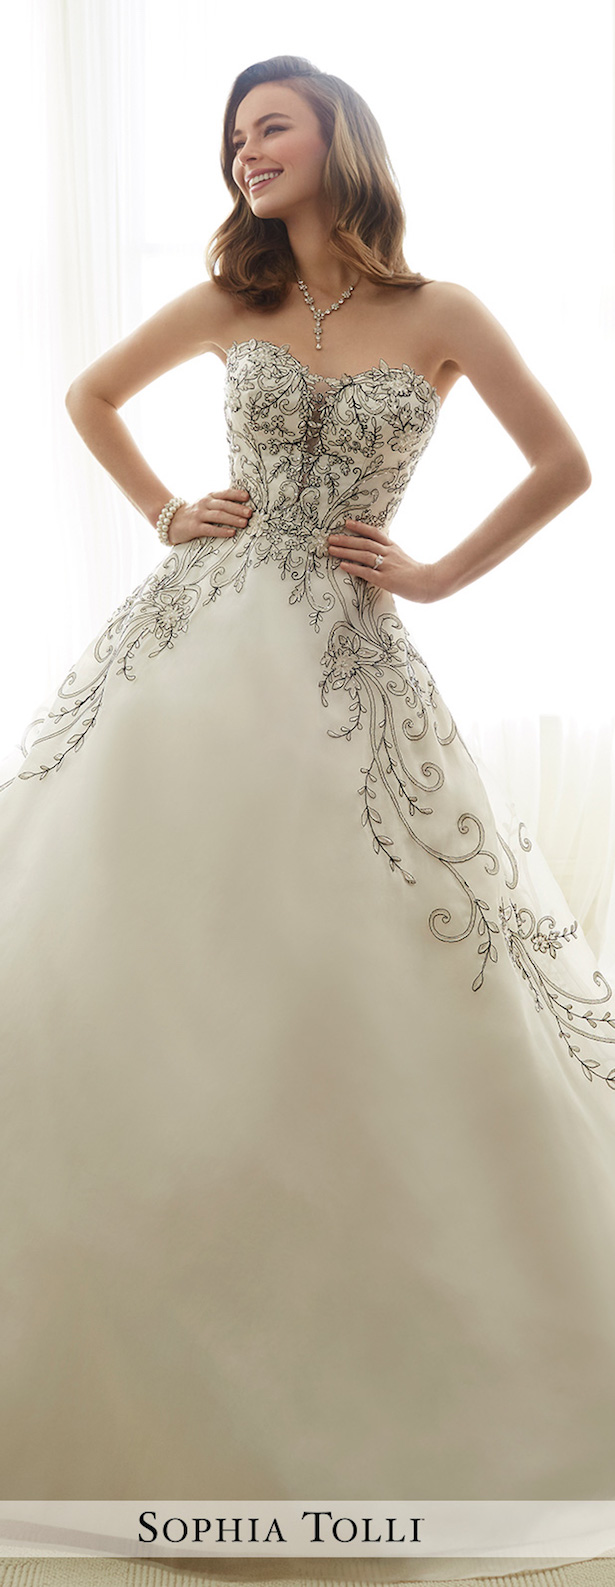 White Wedding Dress With Black 29 Popular  black pattern on